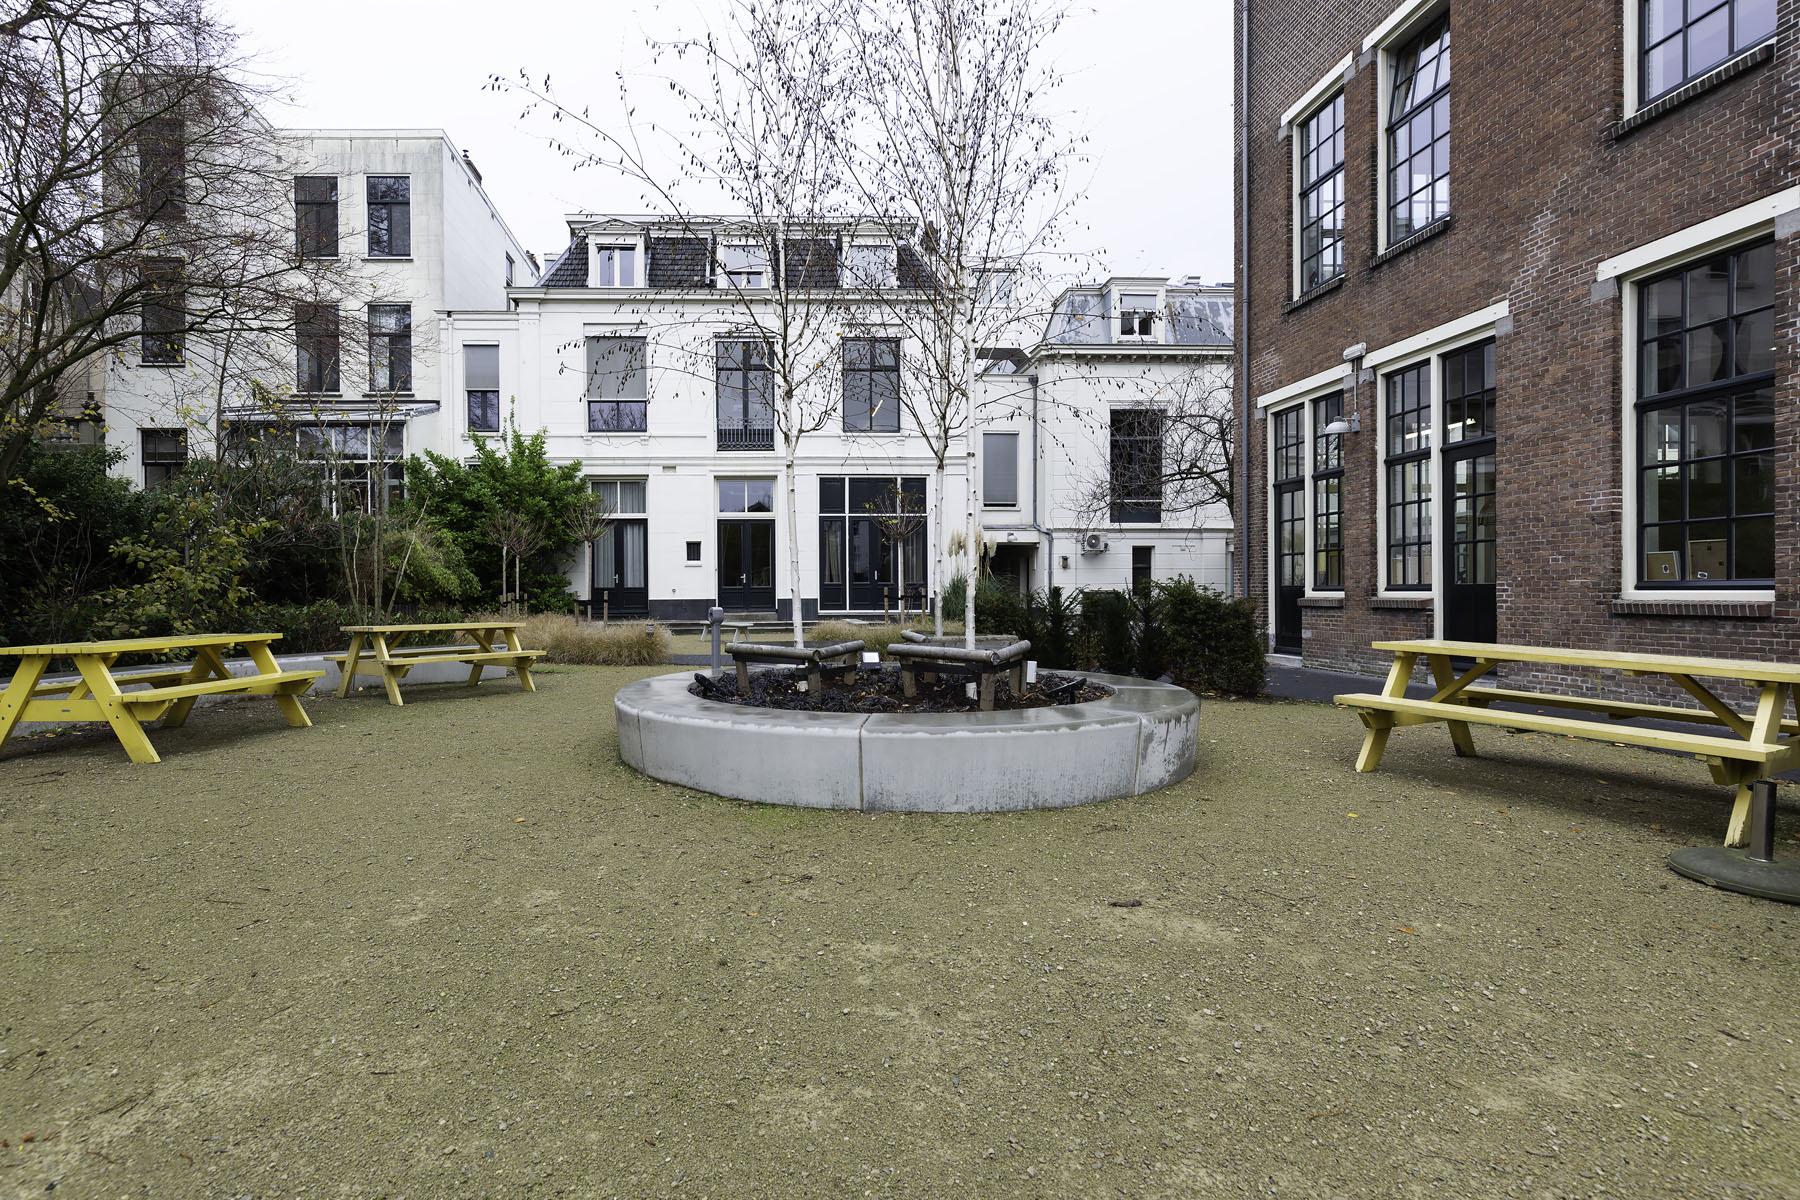 Freedom-Lab-Amsterdam-Jeroen-Machielsen-24.jpg